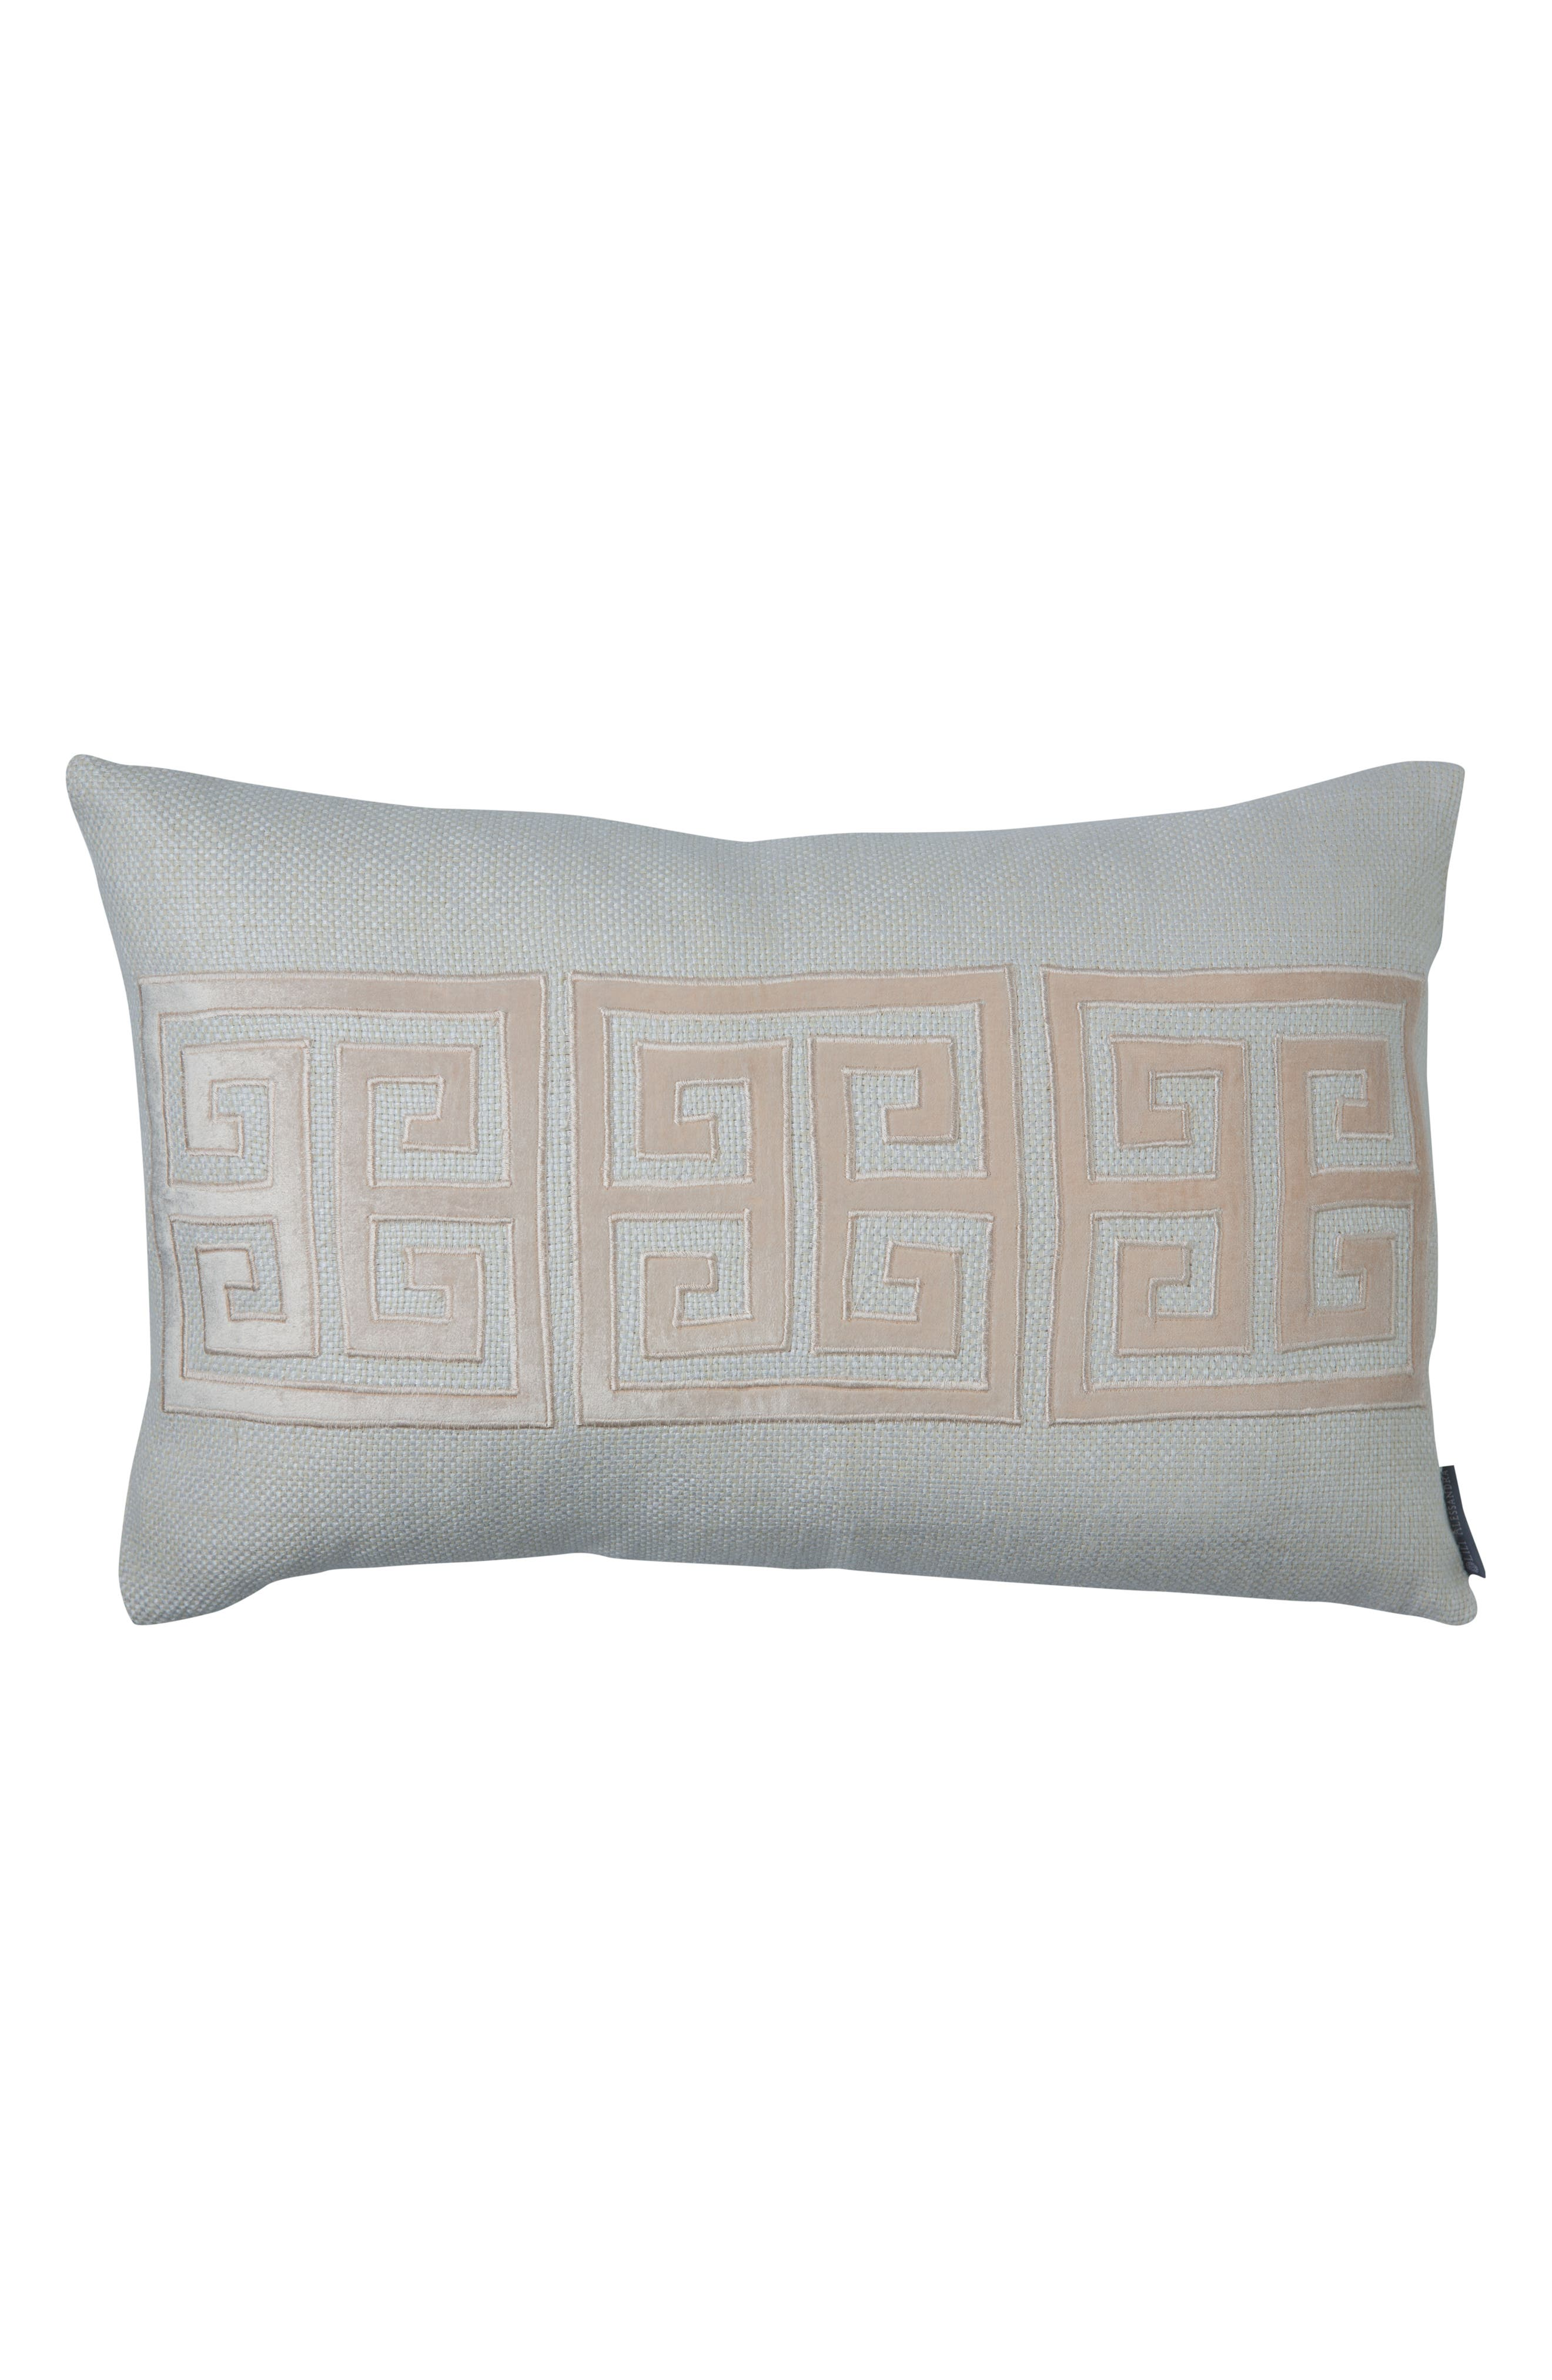 Guy Greek Key Accent Pillow,                         Main,                         color, 100